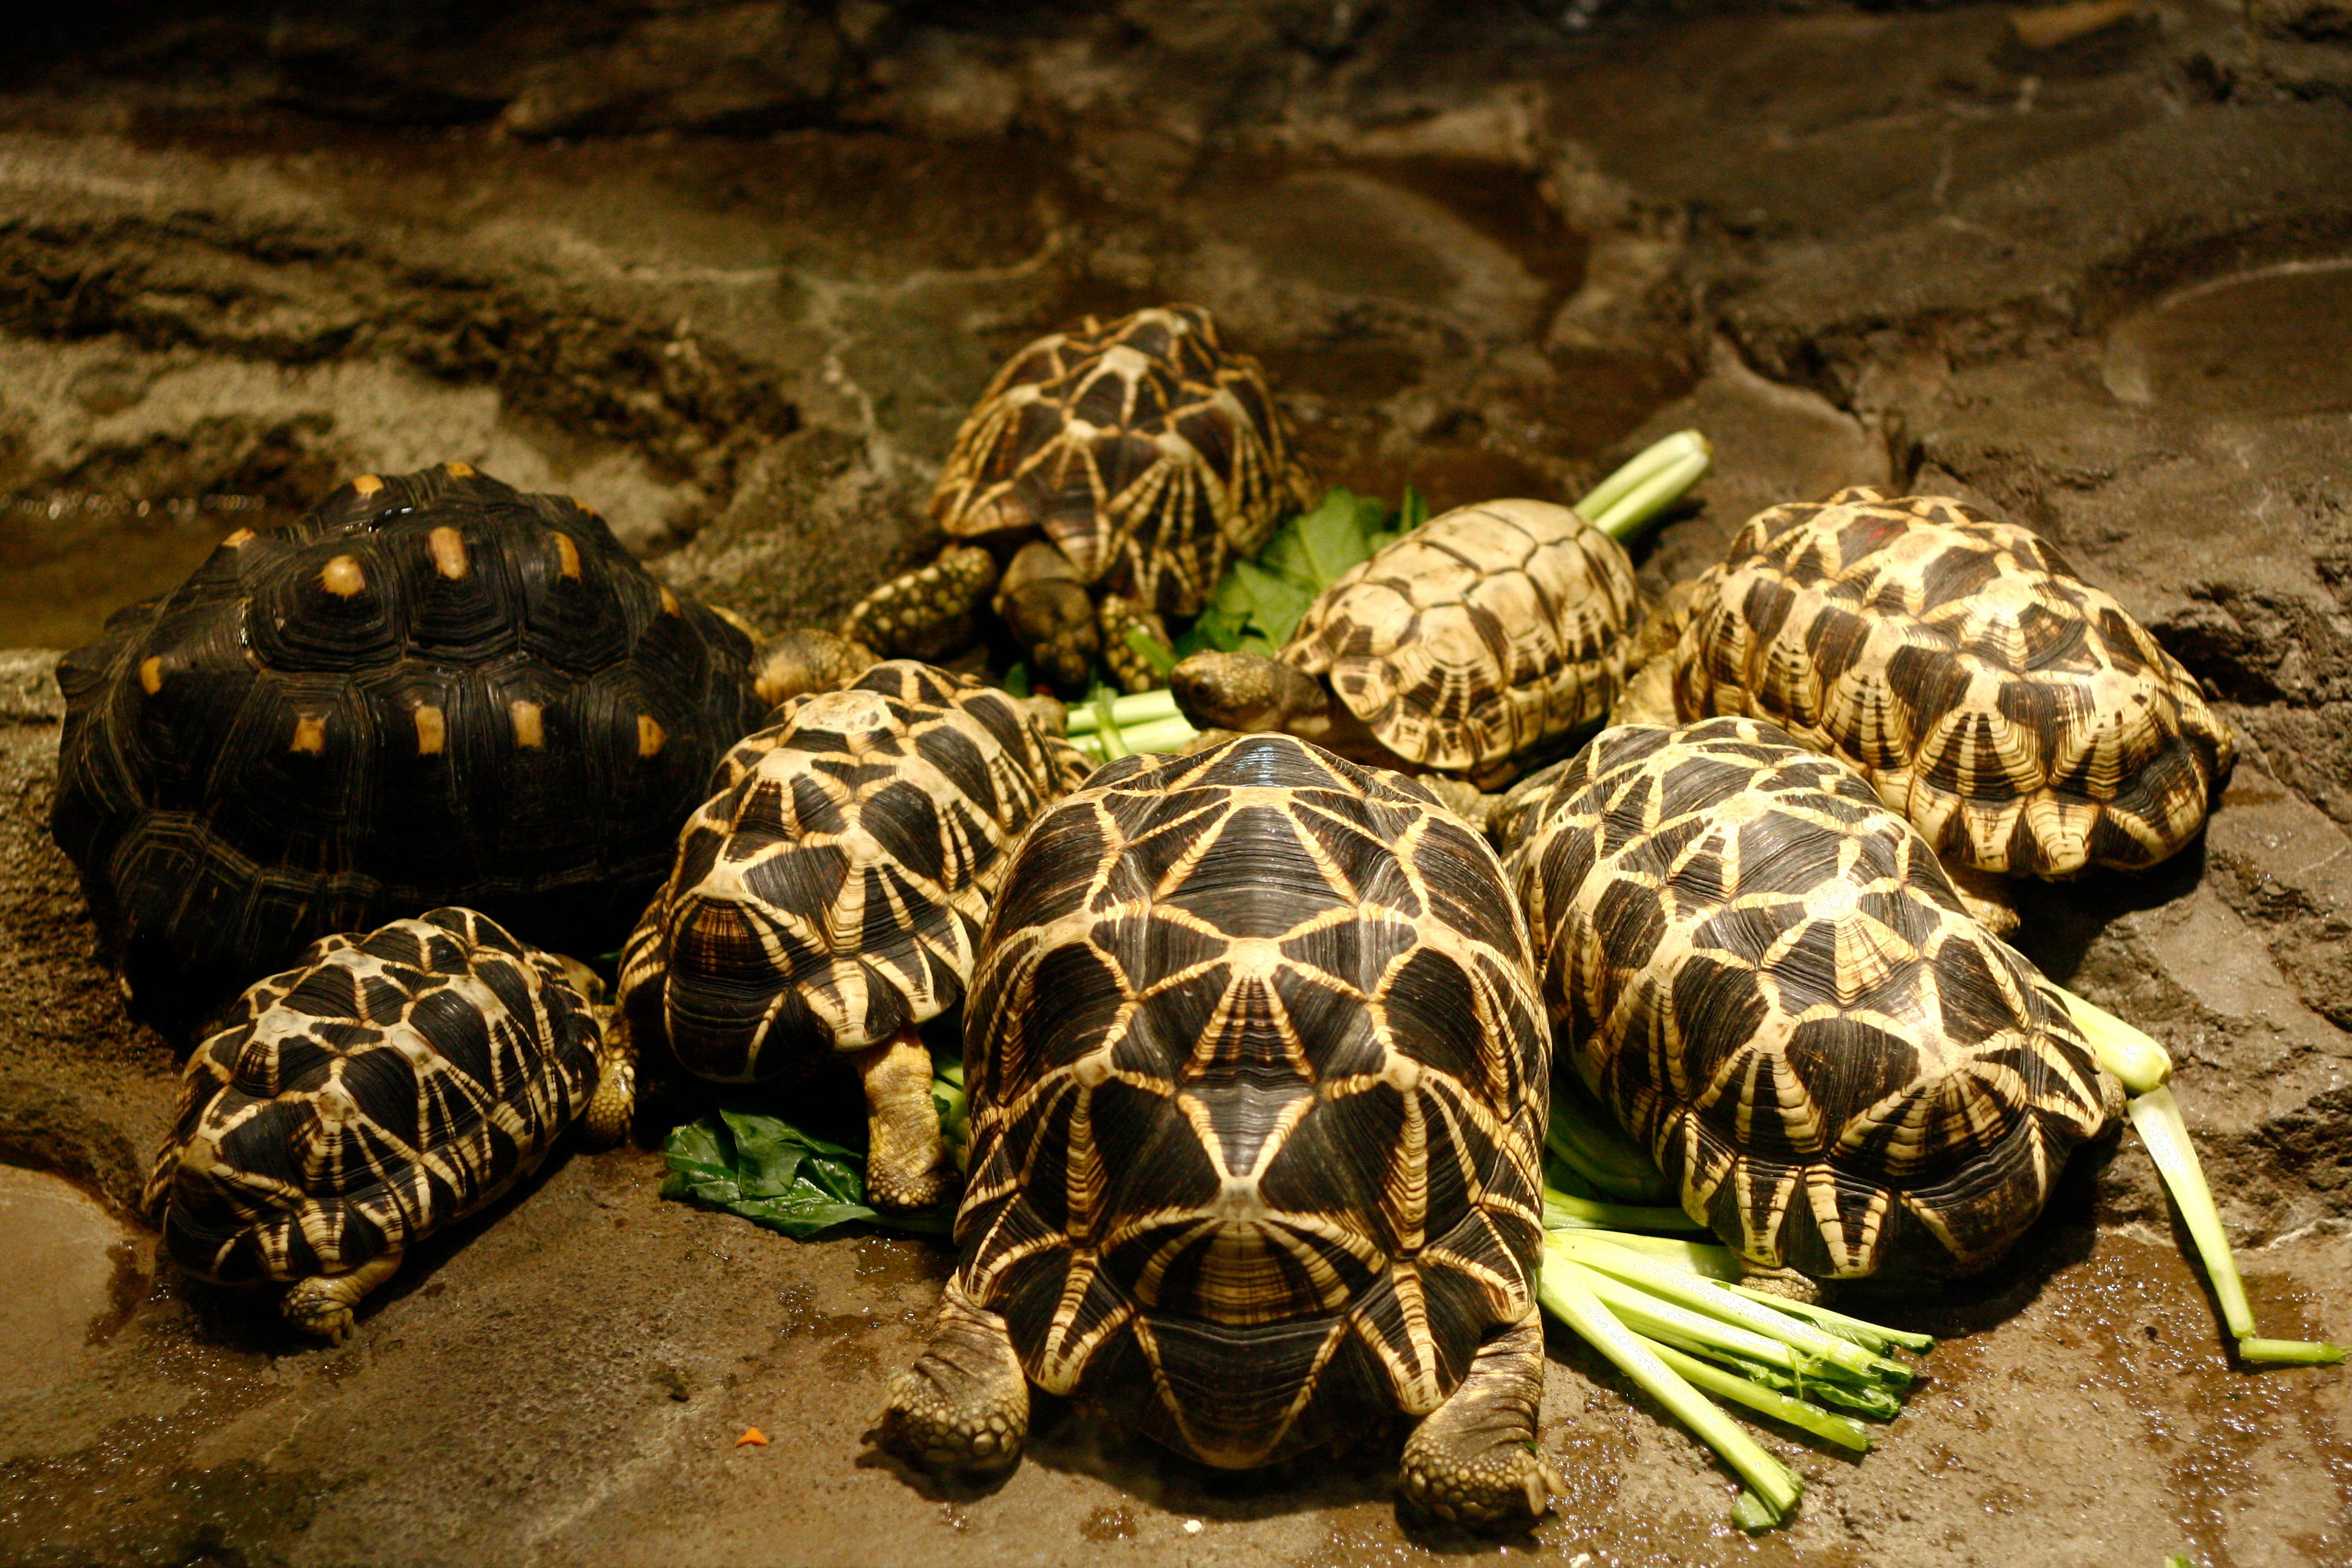 Group of Indian star tortoise (Geochelone elegans) feeding with other tortoise. (Pavaphon Supanantananont/Shutterstock)